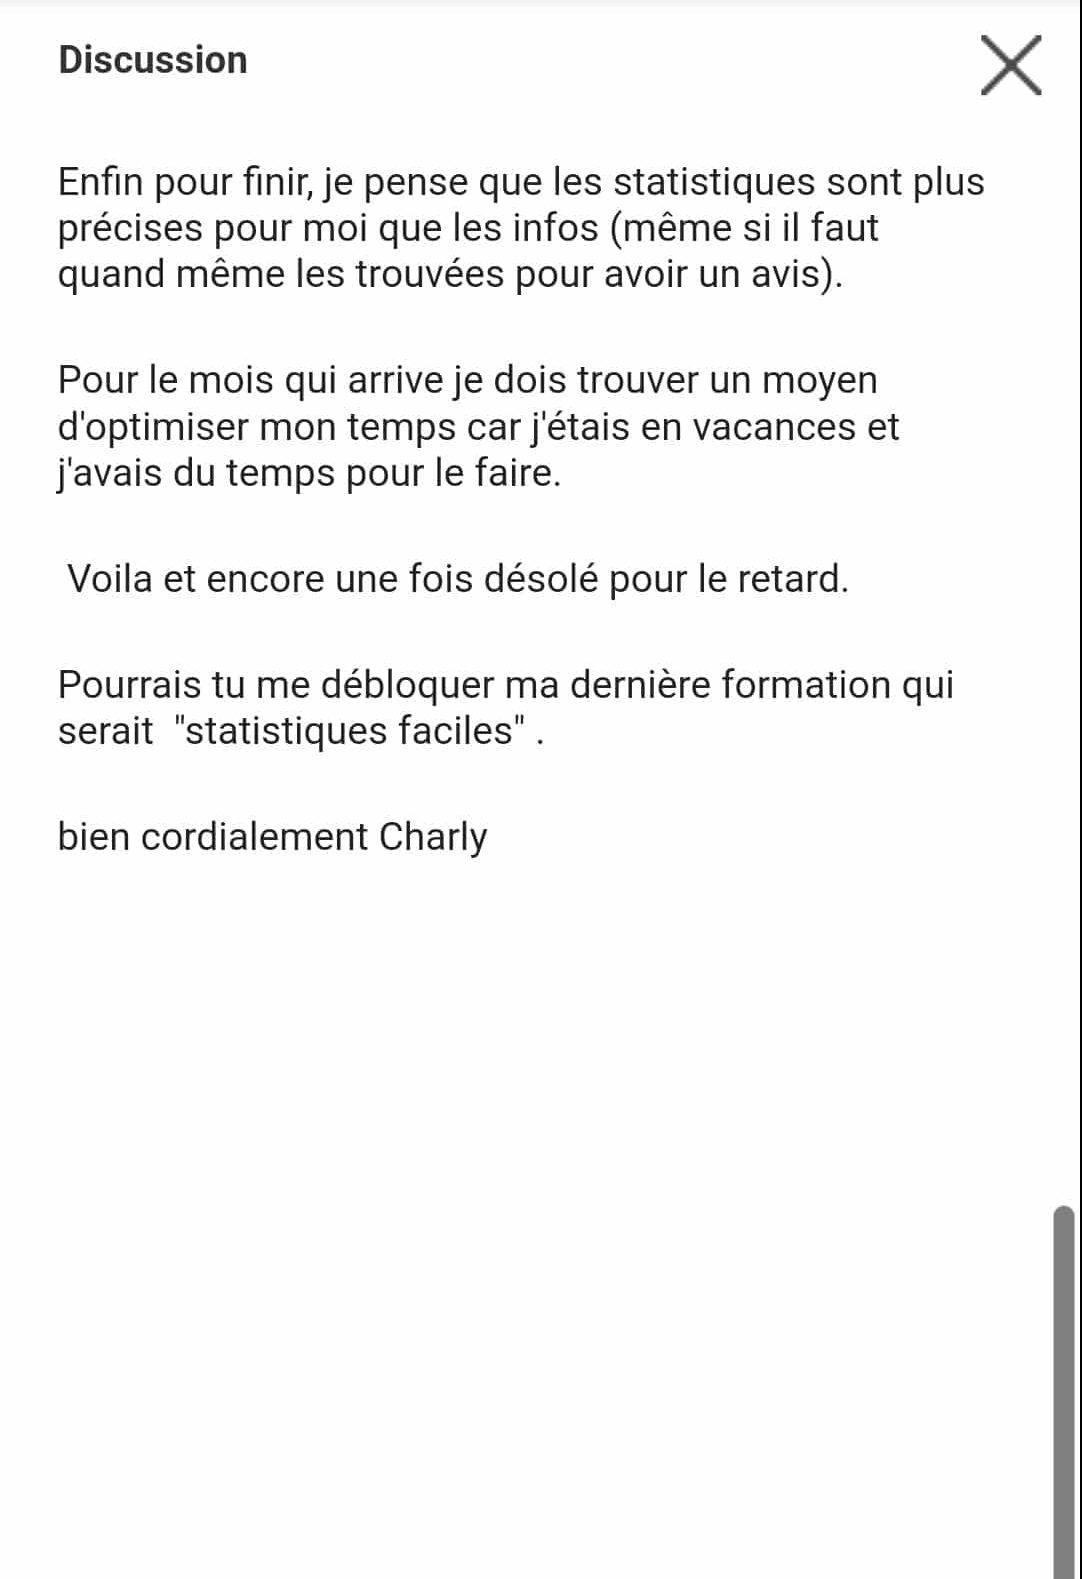 Charly-3